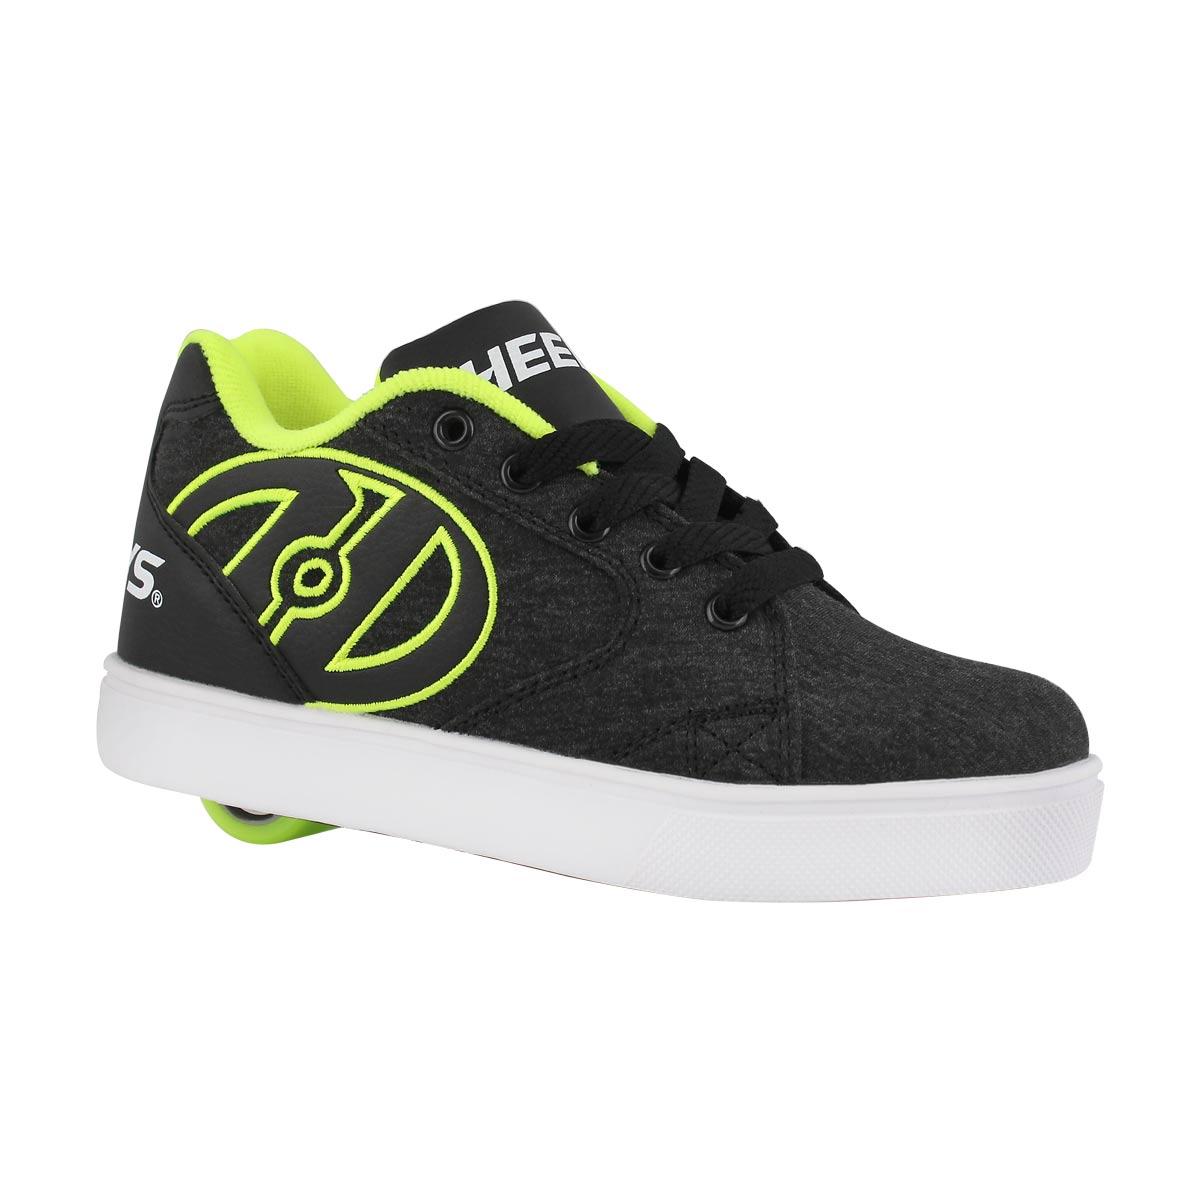 Bys Vopel blk/yllw skate sneaker